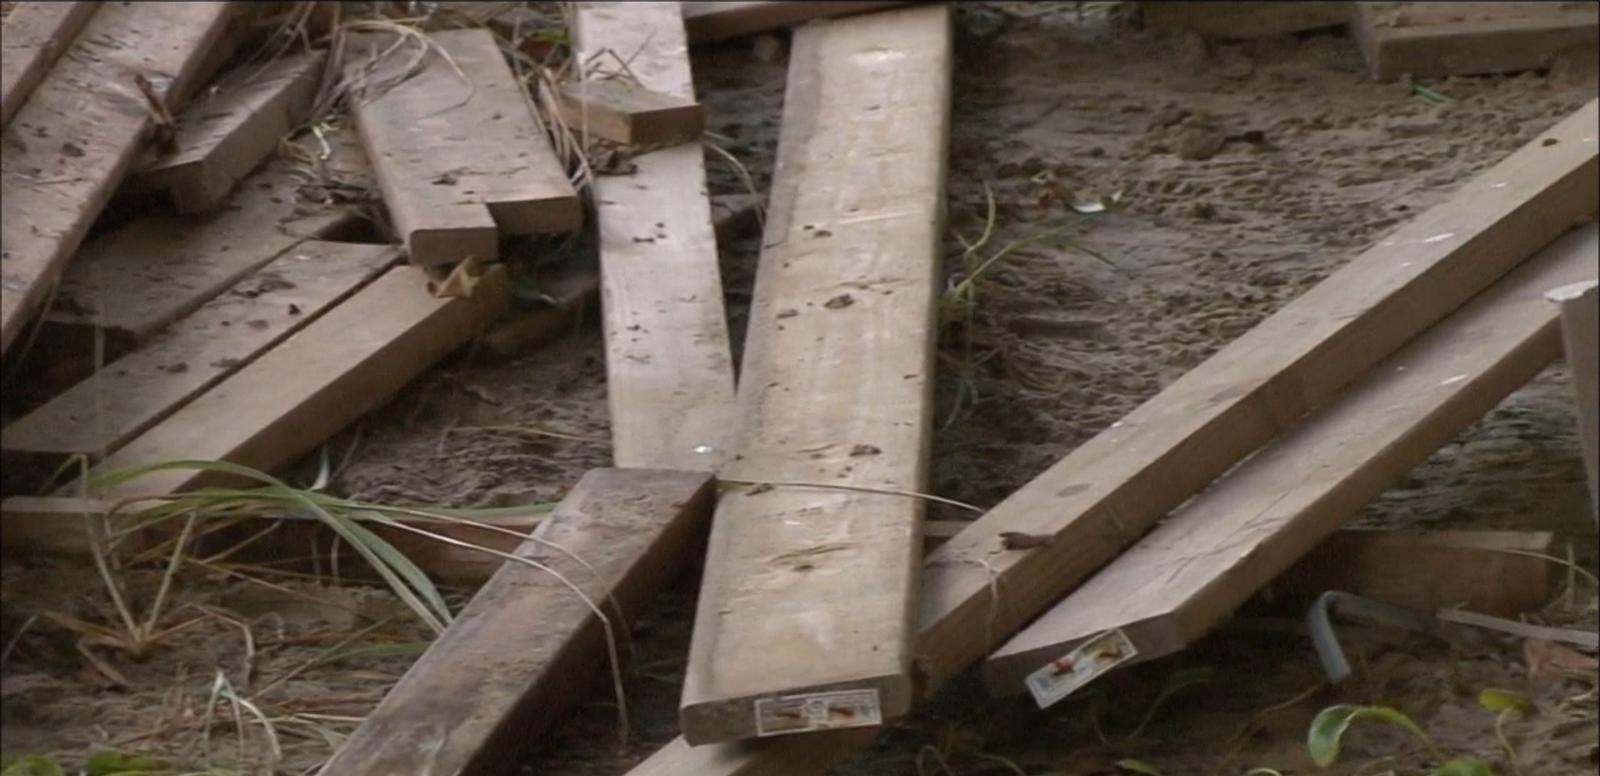 VIDEO: North Carolina Deck Accident Details Start to Emerge